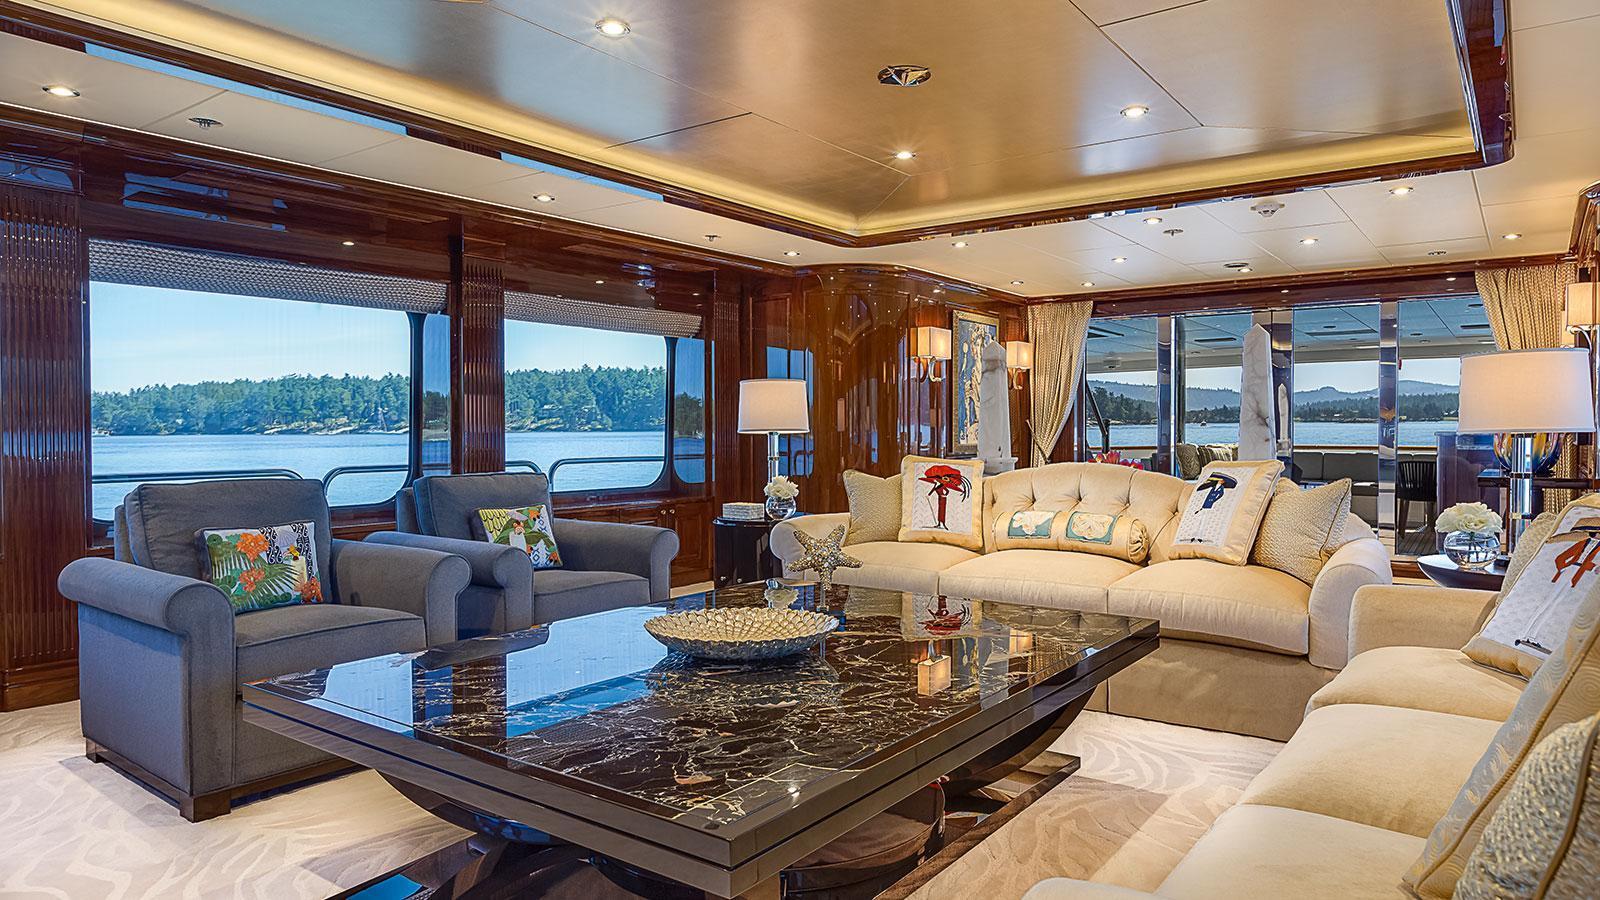 d-natalin-iv-expedition-yacht-christensen-2014-49m-saloon